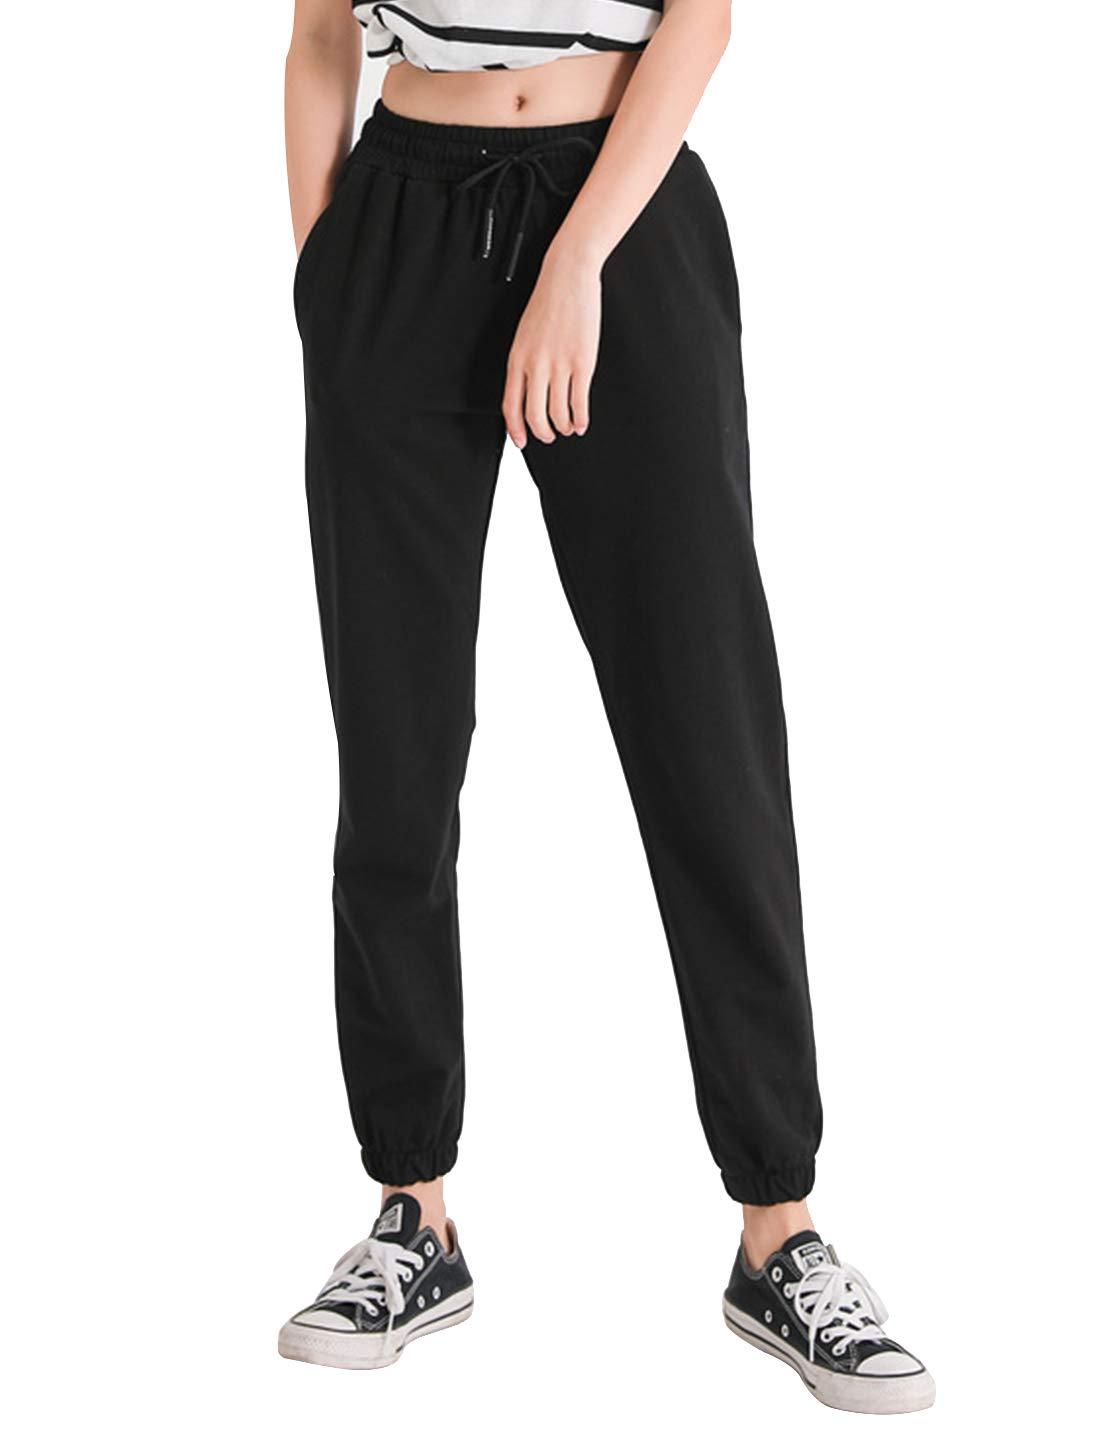 Yimoon Women's Casual Elastic Waist Drawstring Jogger Pants Harem Sweatpants